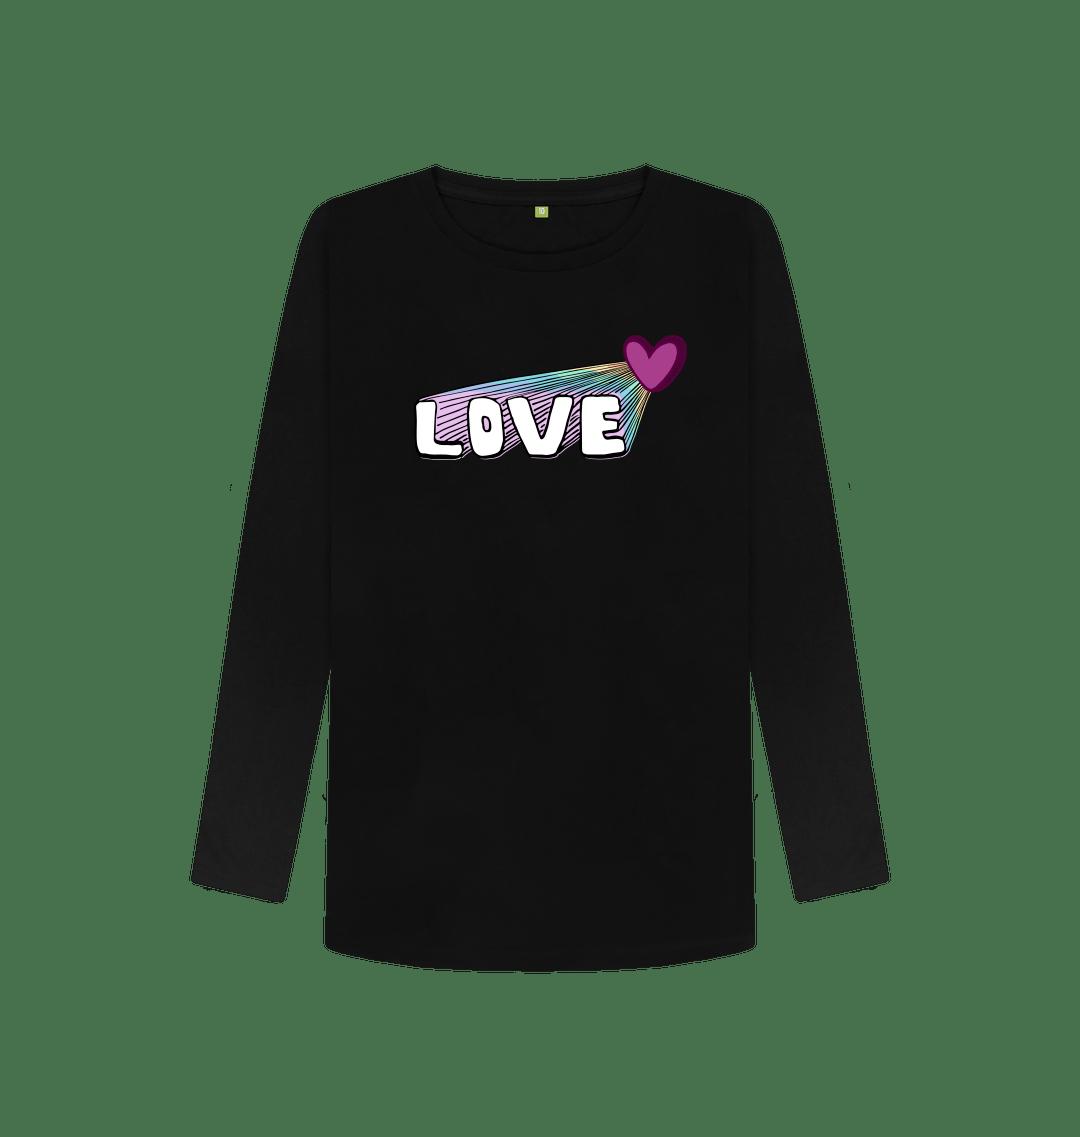 Organic Cotton Women's Let Your Love Shine Longsleeve Top in Black